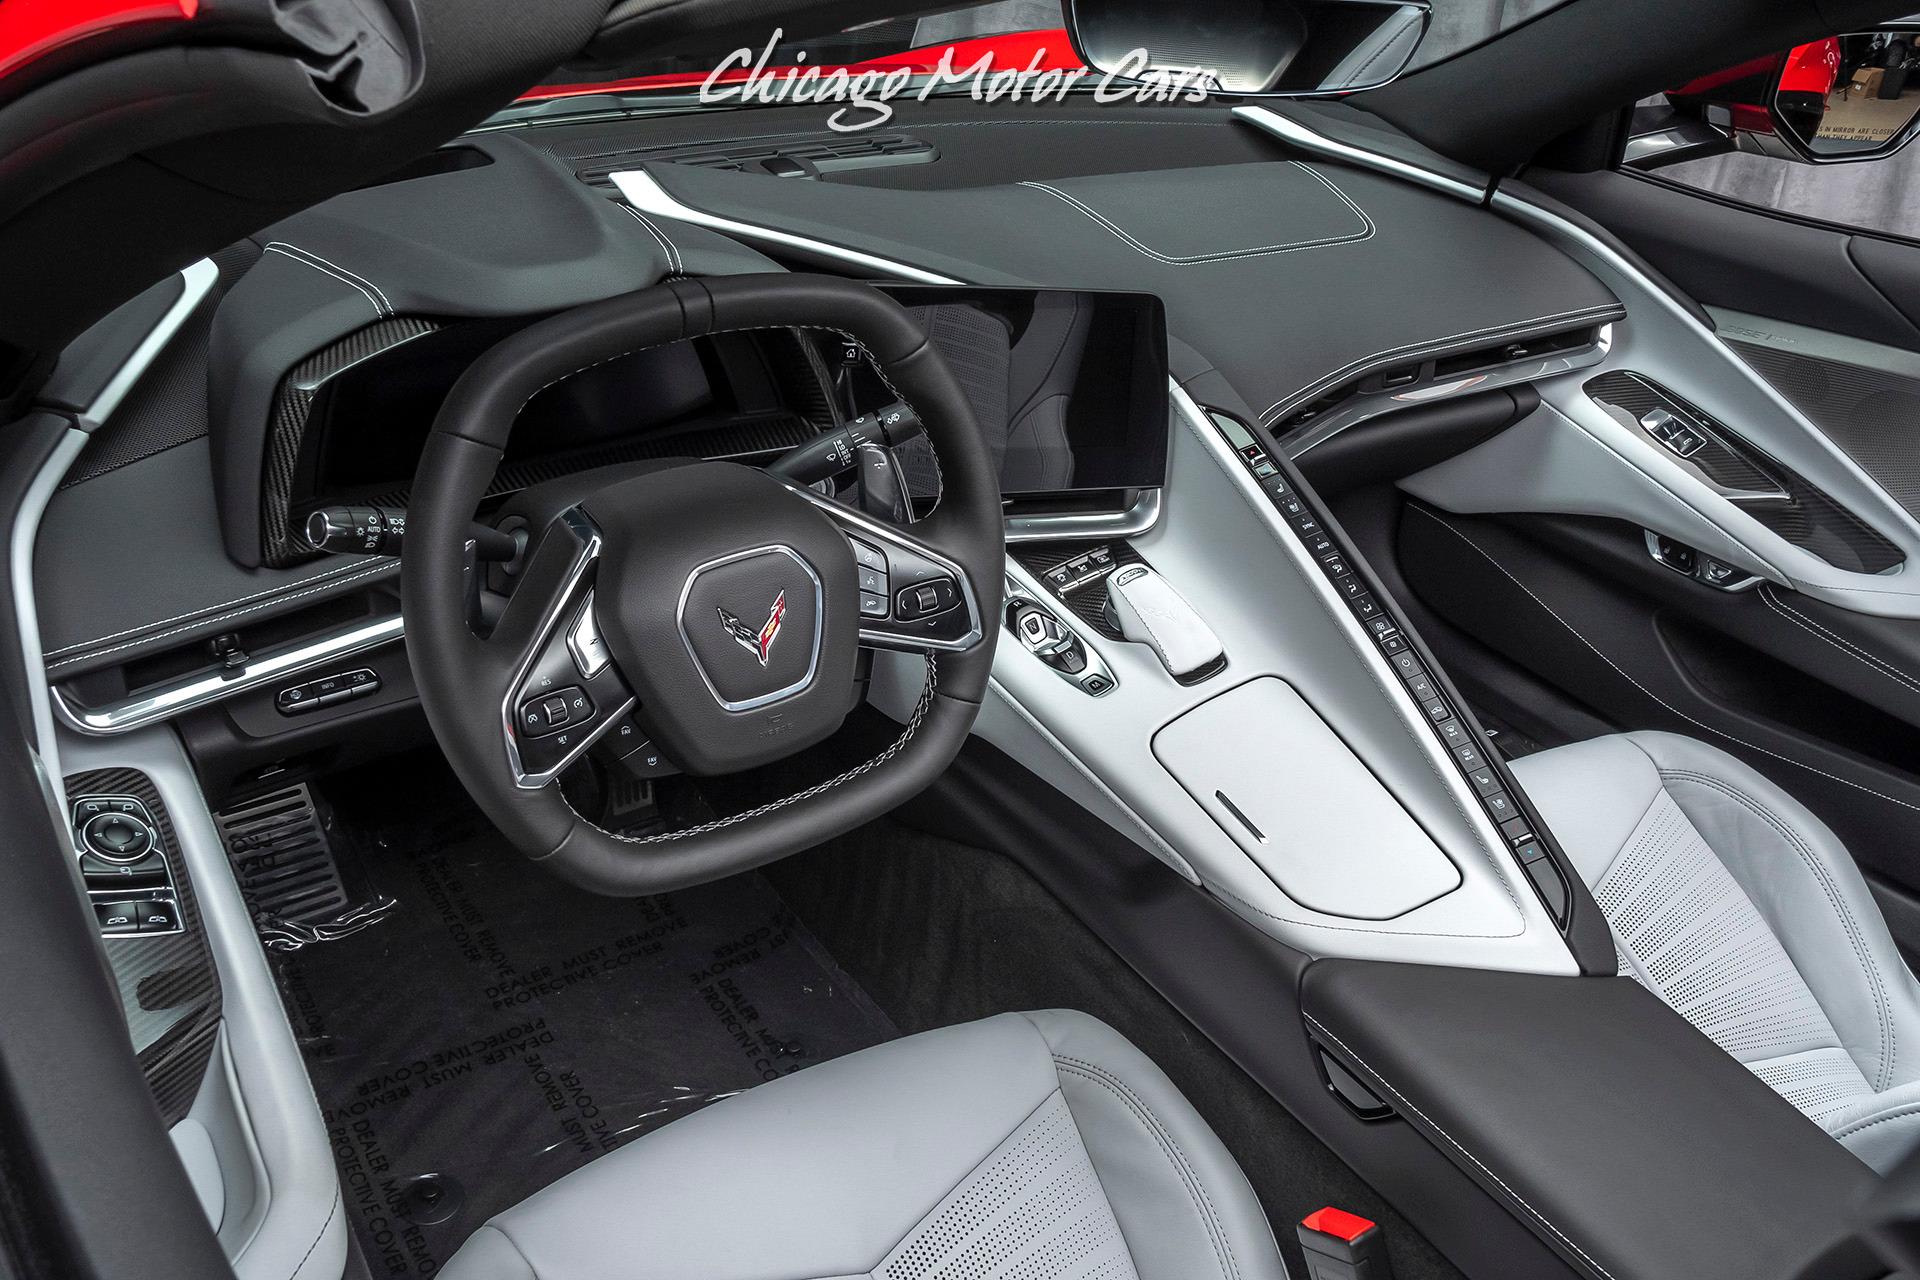 Used-2020-Chevrolet-Corvette-C8-Stingray-2LT-Coupe-Z51-PERFORMANCE-PACKAGE-PAINT-PROTECTION-FILM